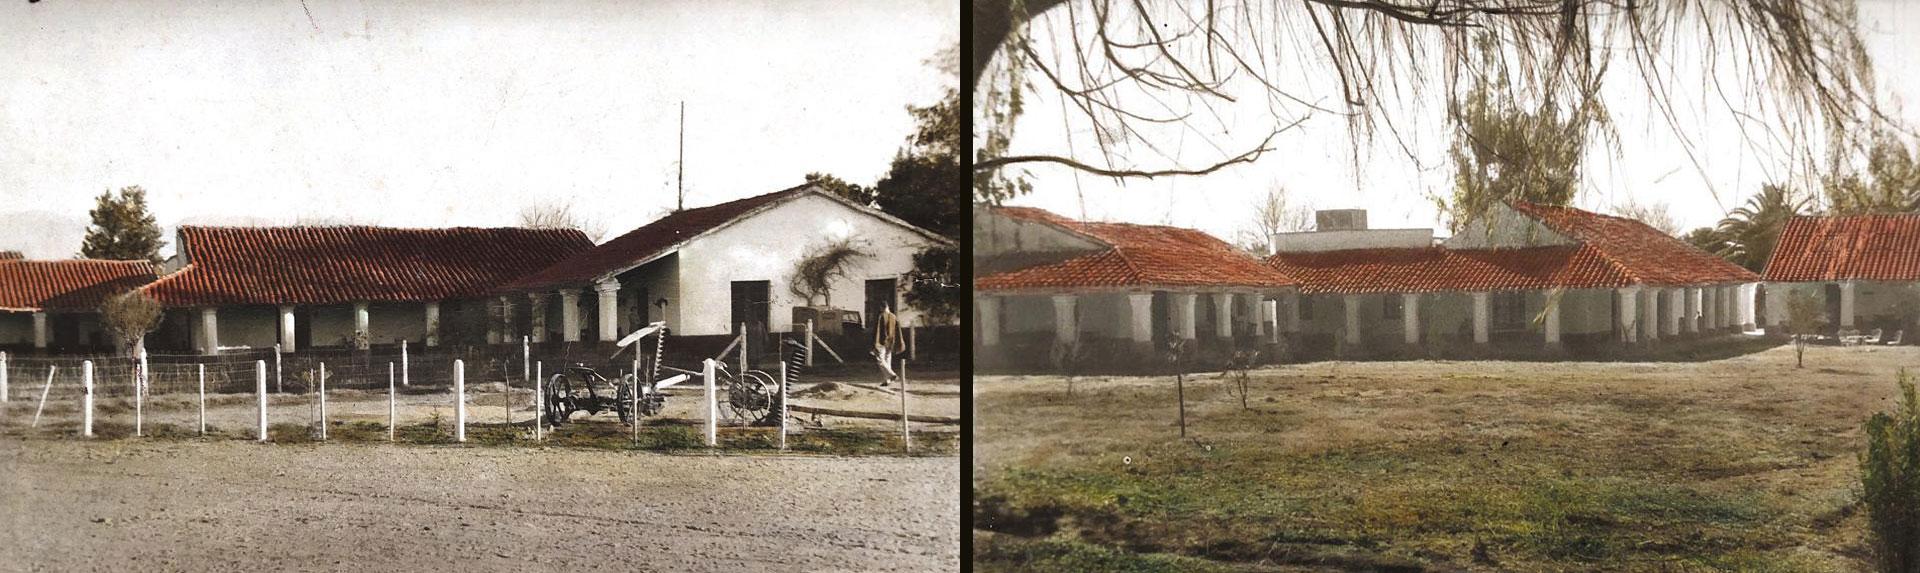 Historia de Estancia Zarate